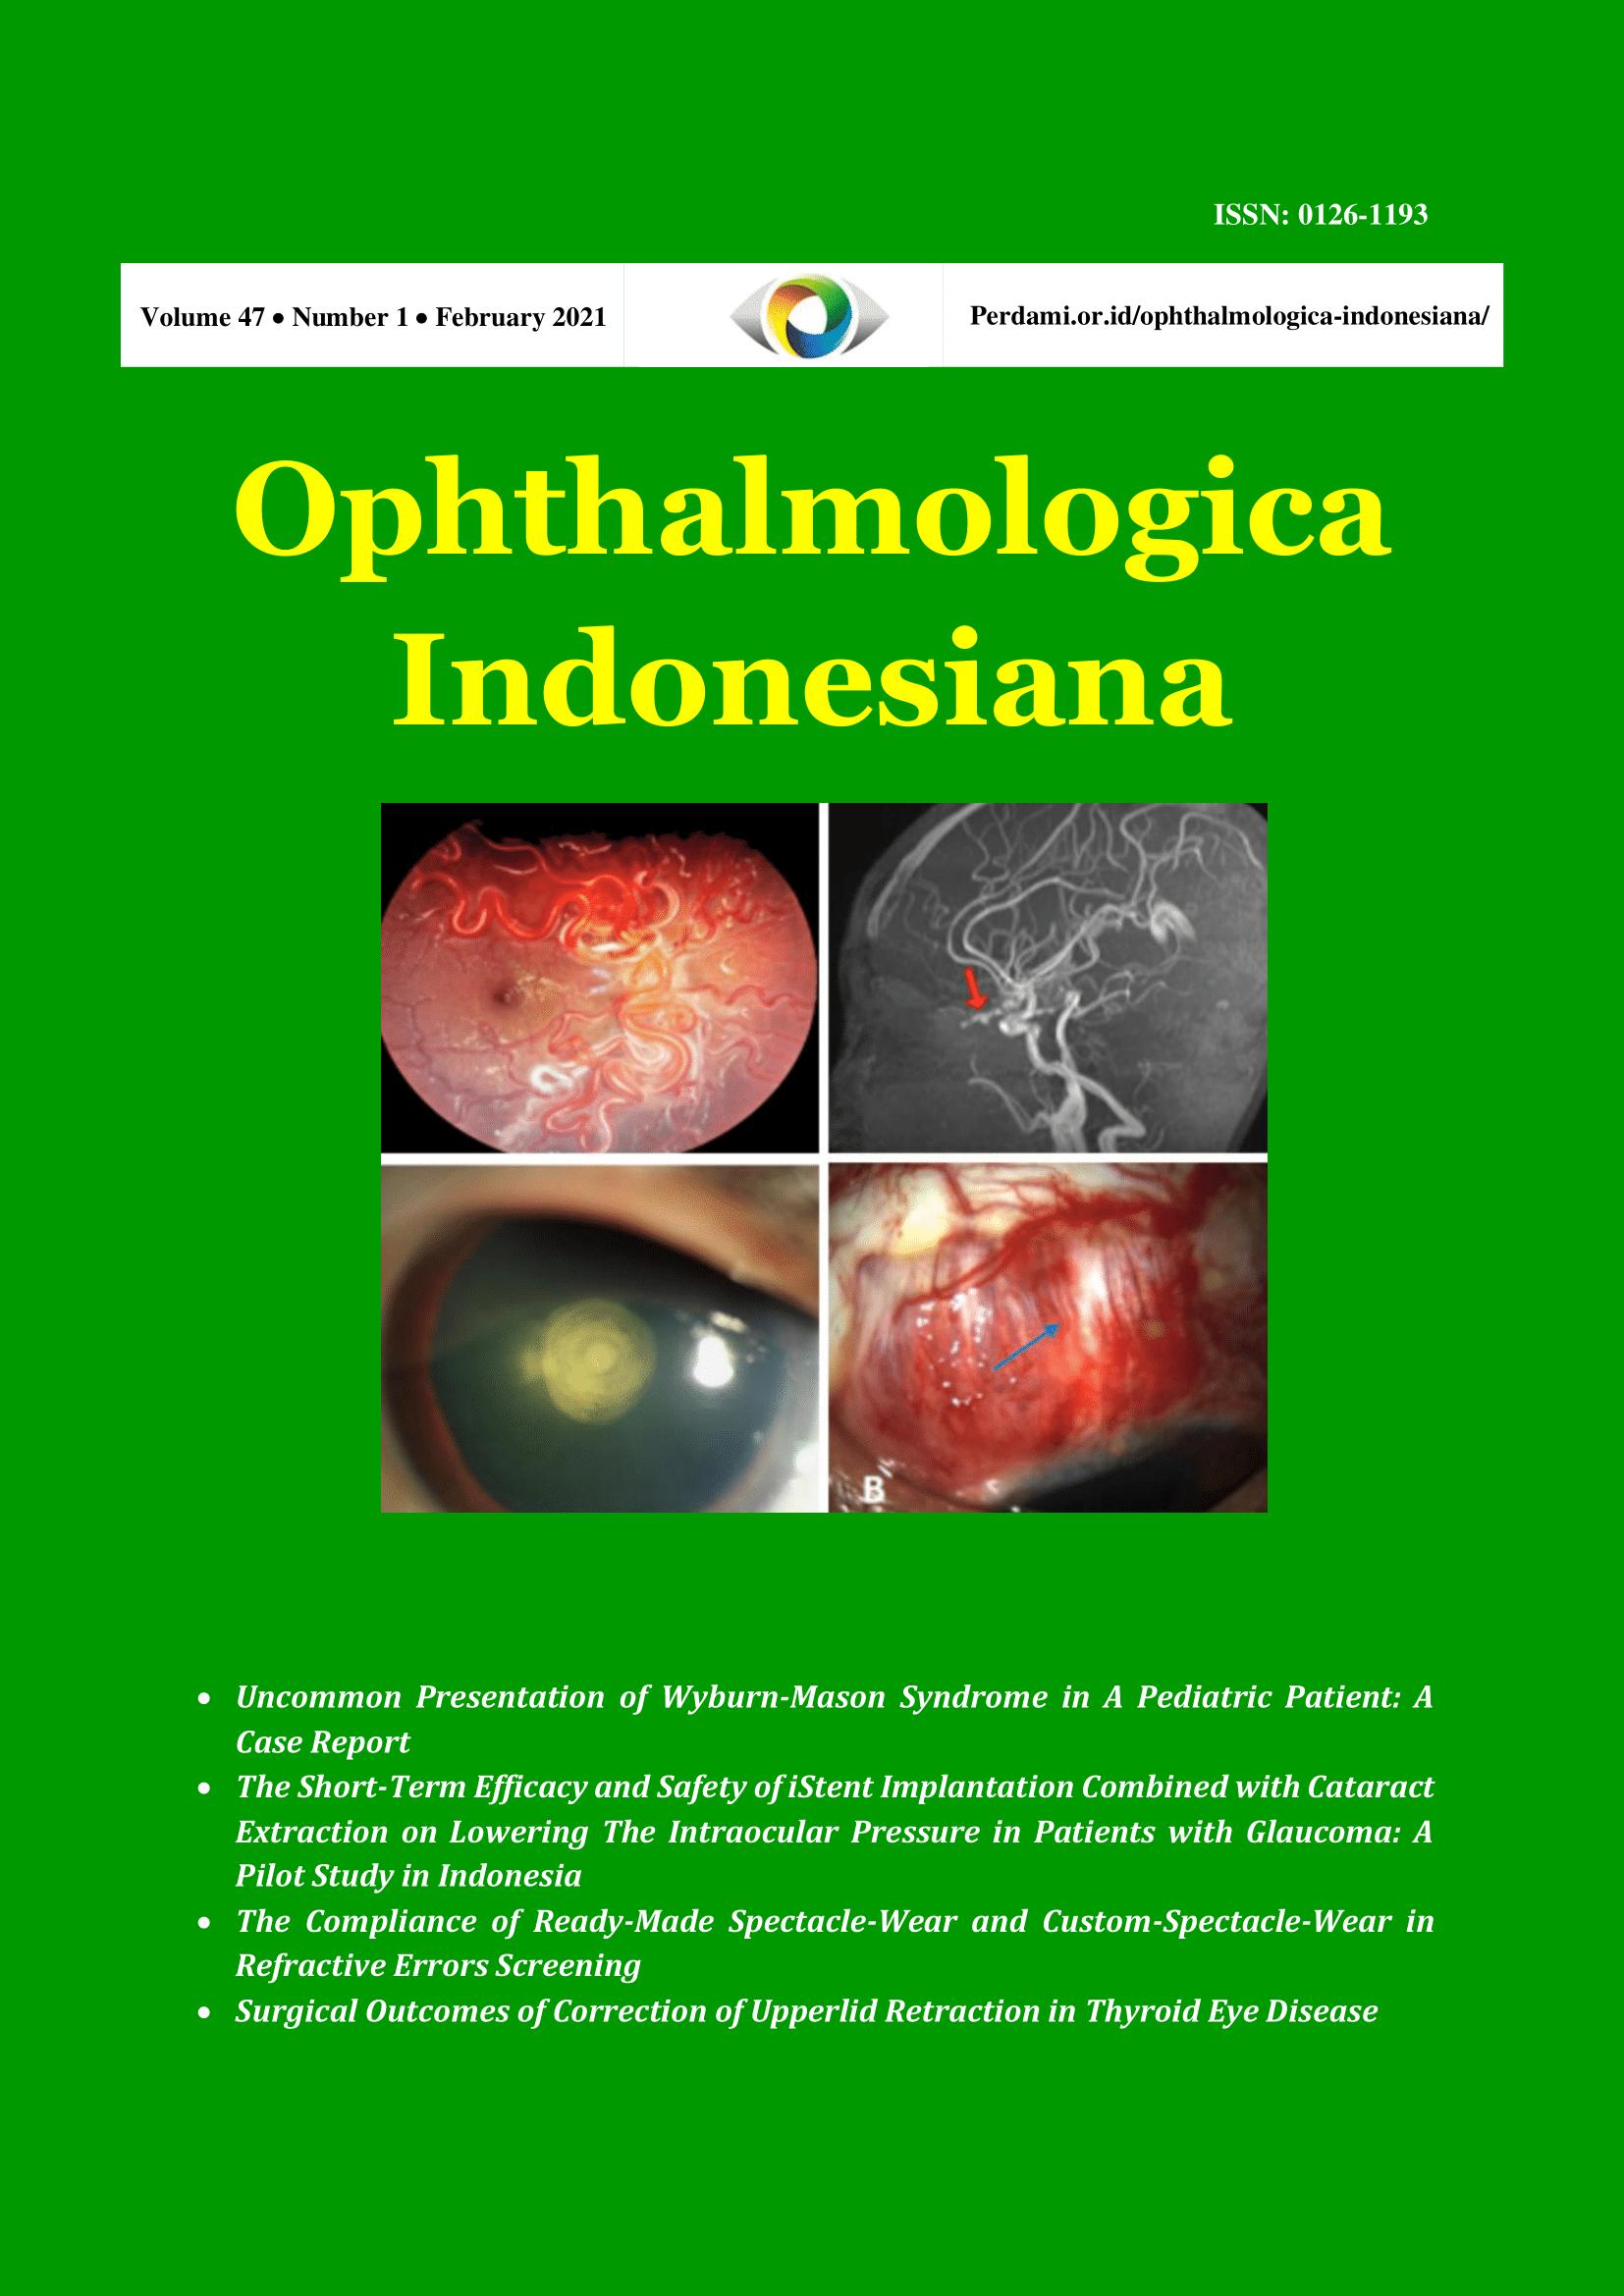 View Vol. 47 No. 1 (2021): Ophthalmologica Indonesiana